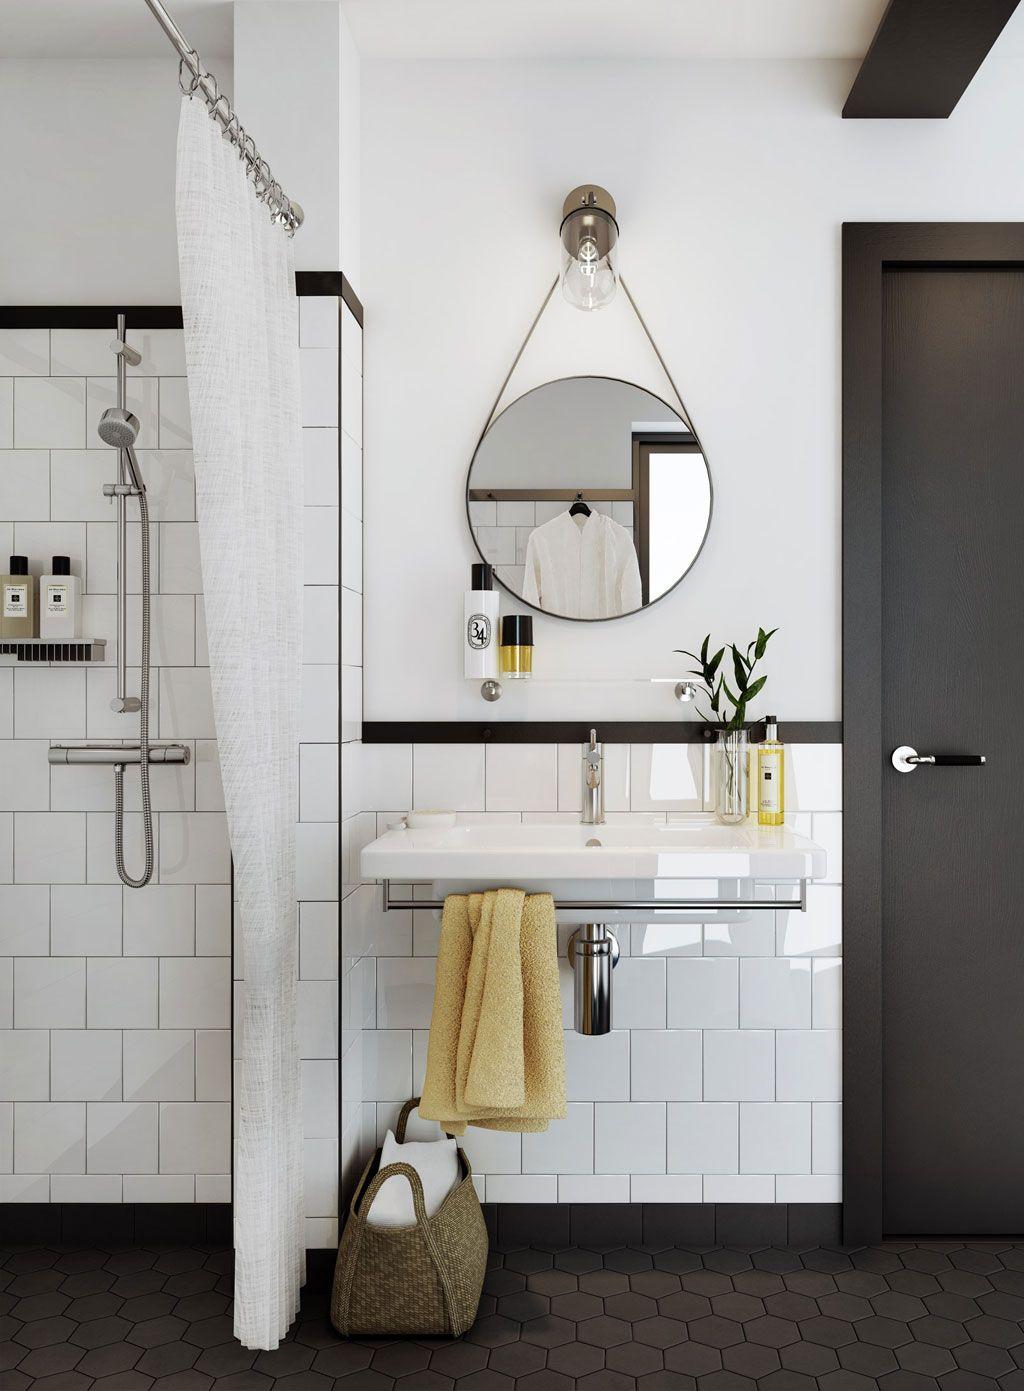 Laderfabriken | Round mirrors, Open showers and Mirror hanging